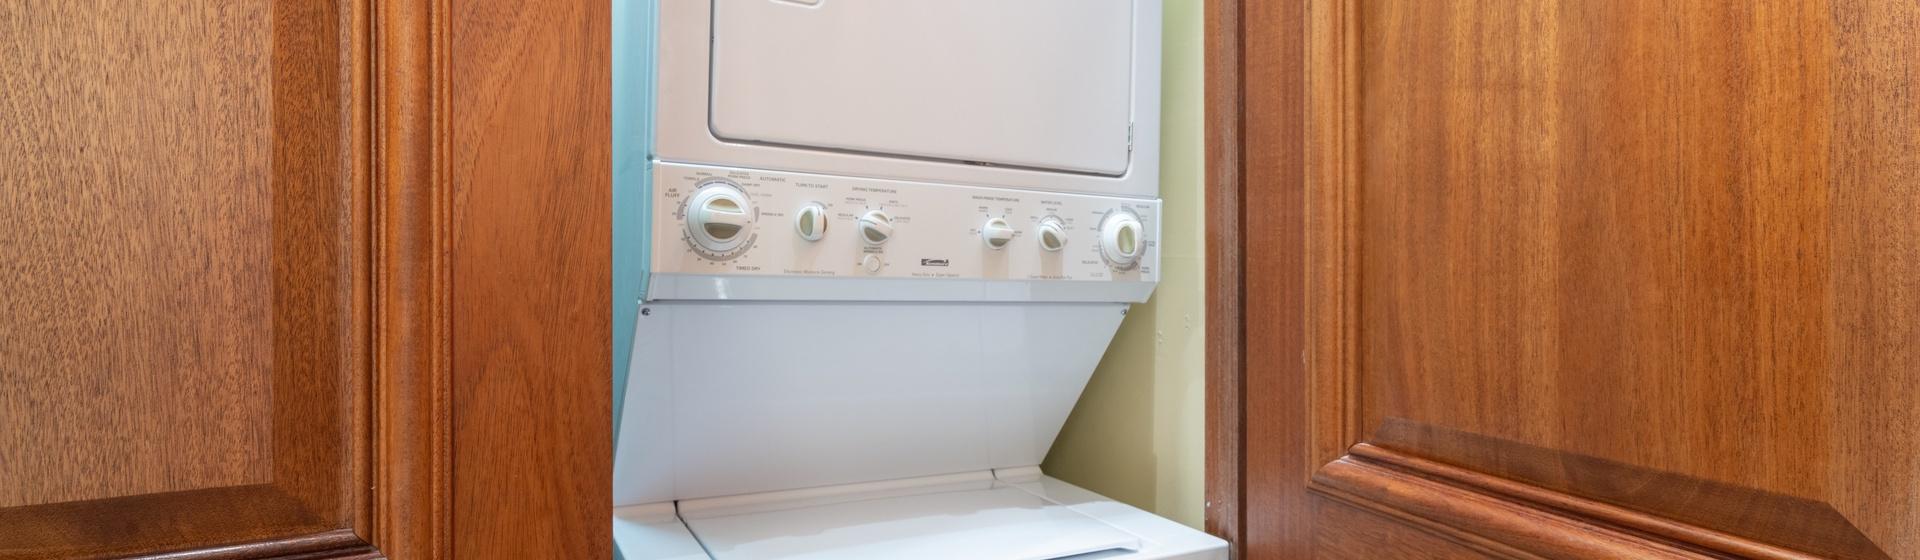 3.01-telluride-tres-casas-B-laundry-web.jpg